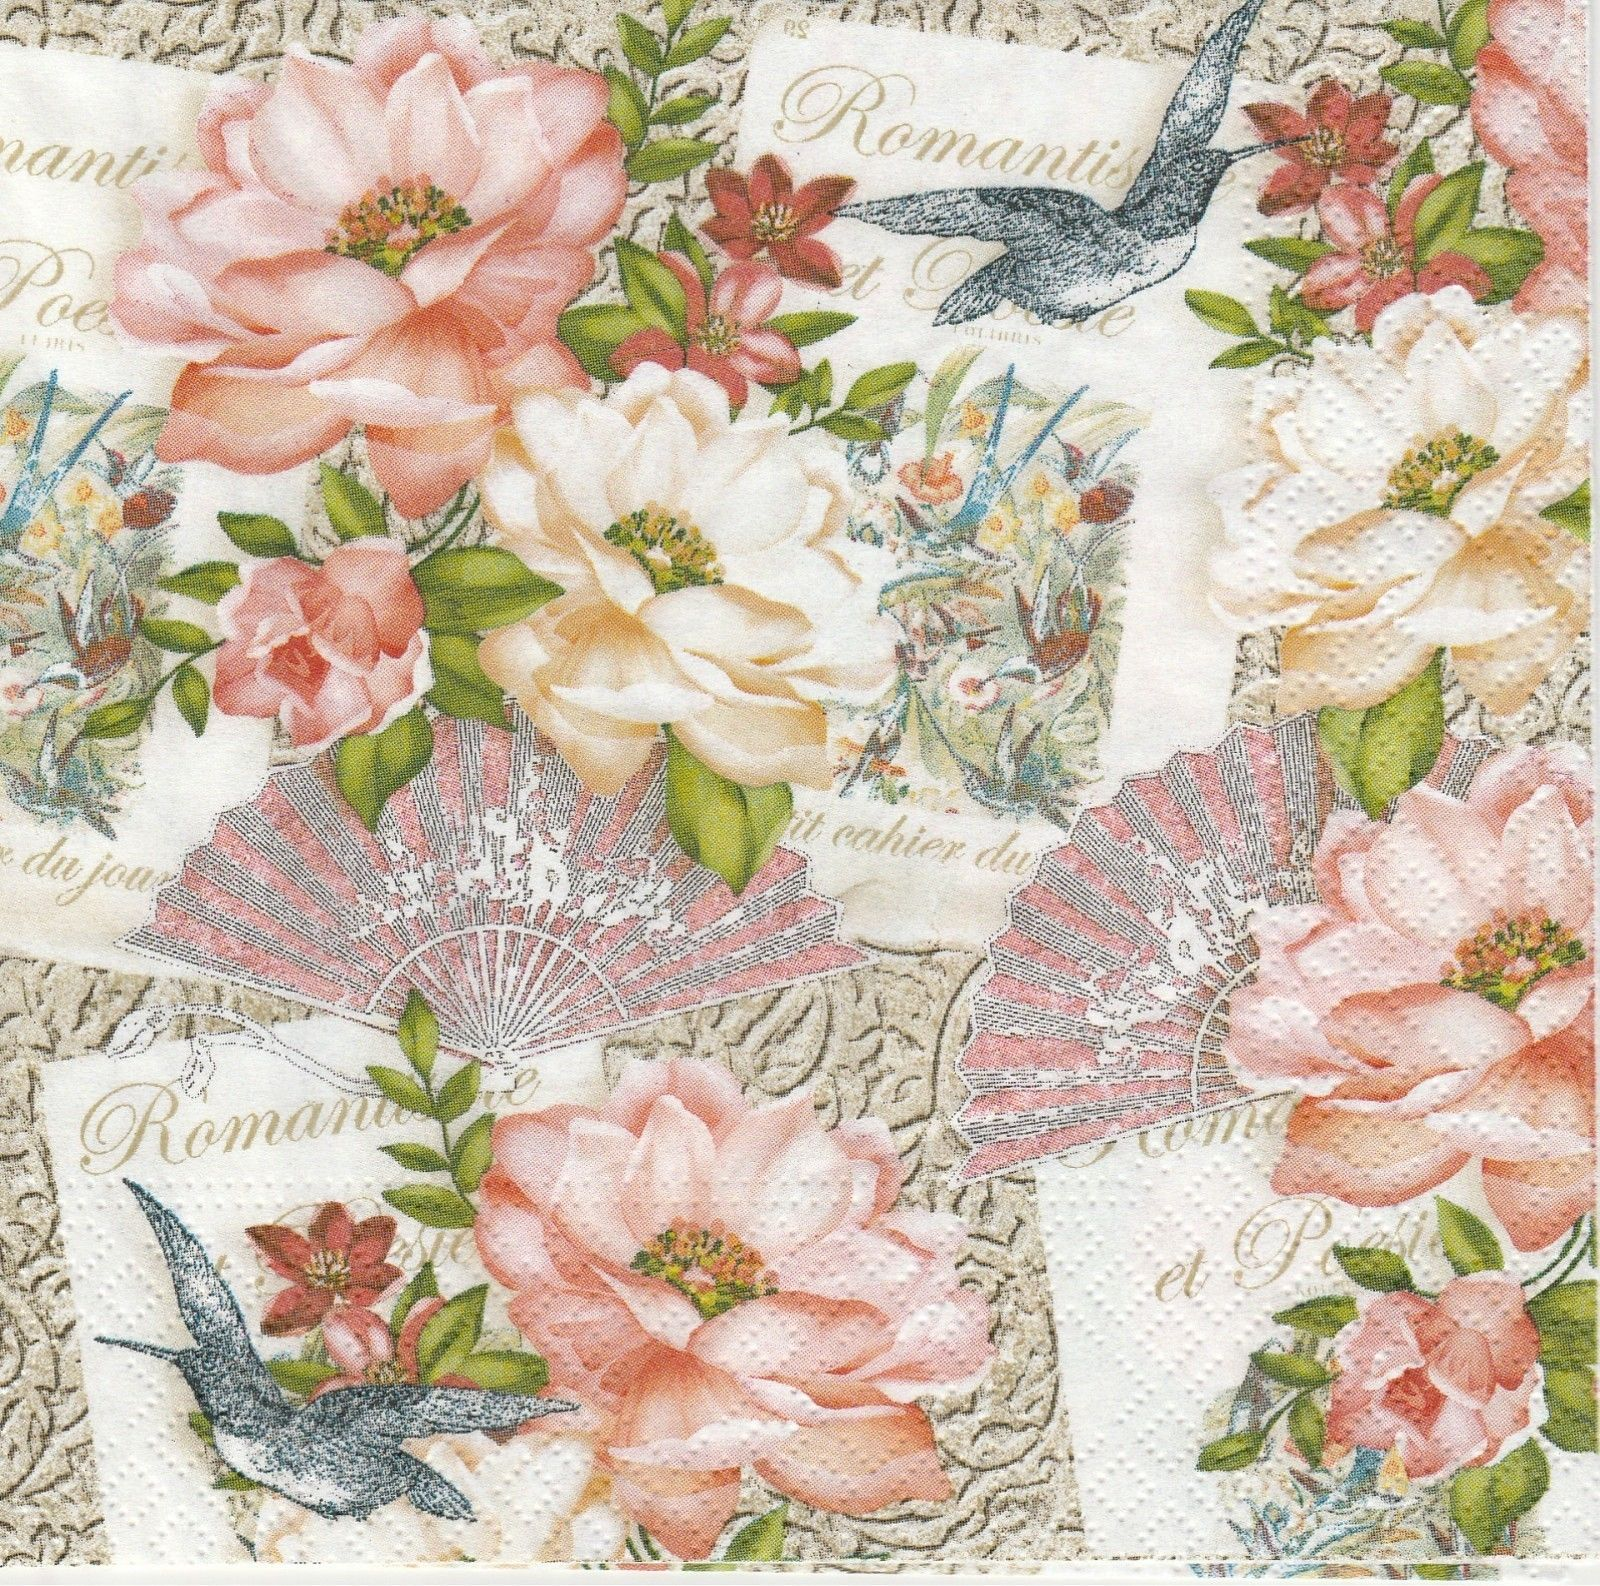 Tissue Crafting x 2 Serviette Vintage Angel Paper Napkins for Decoupage